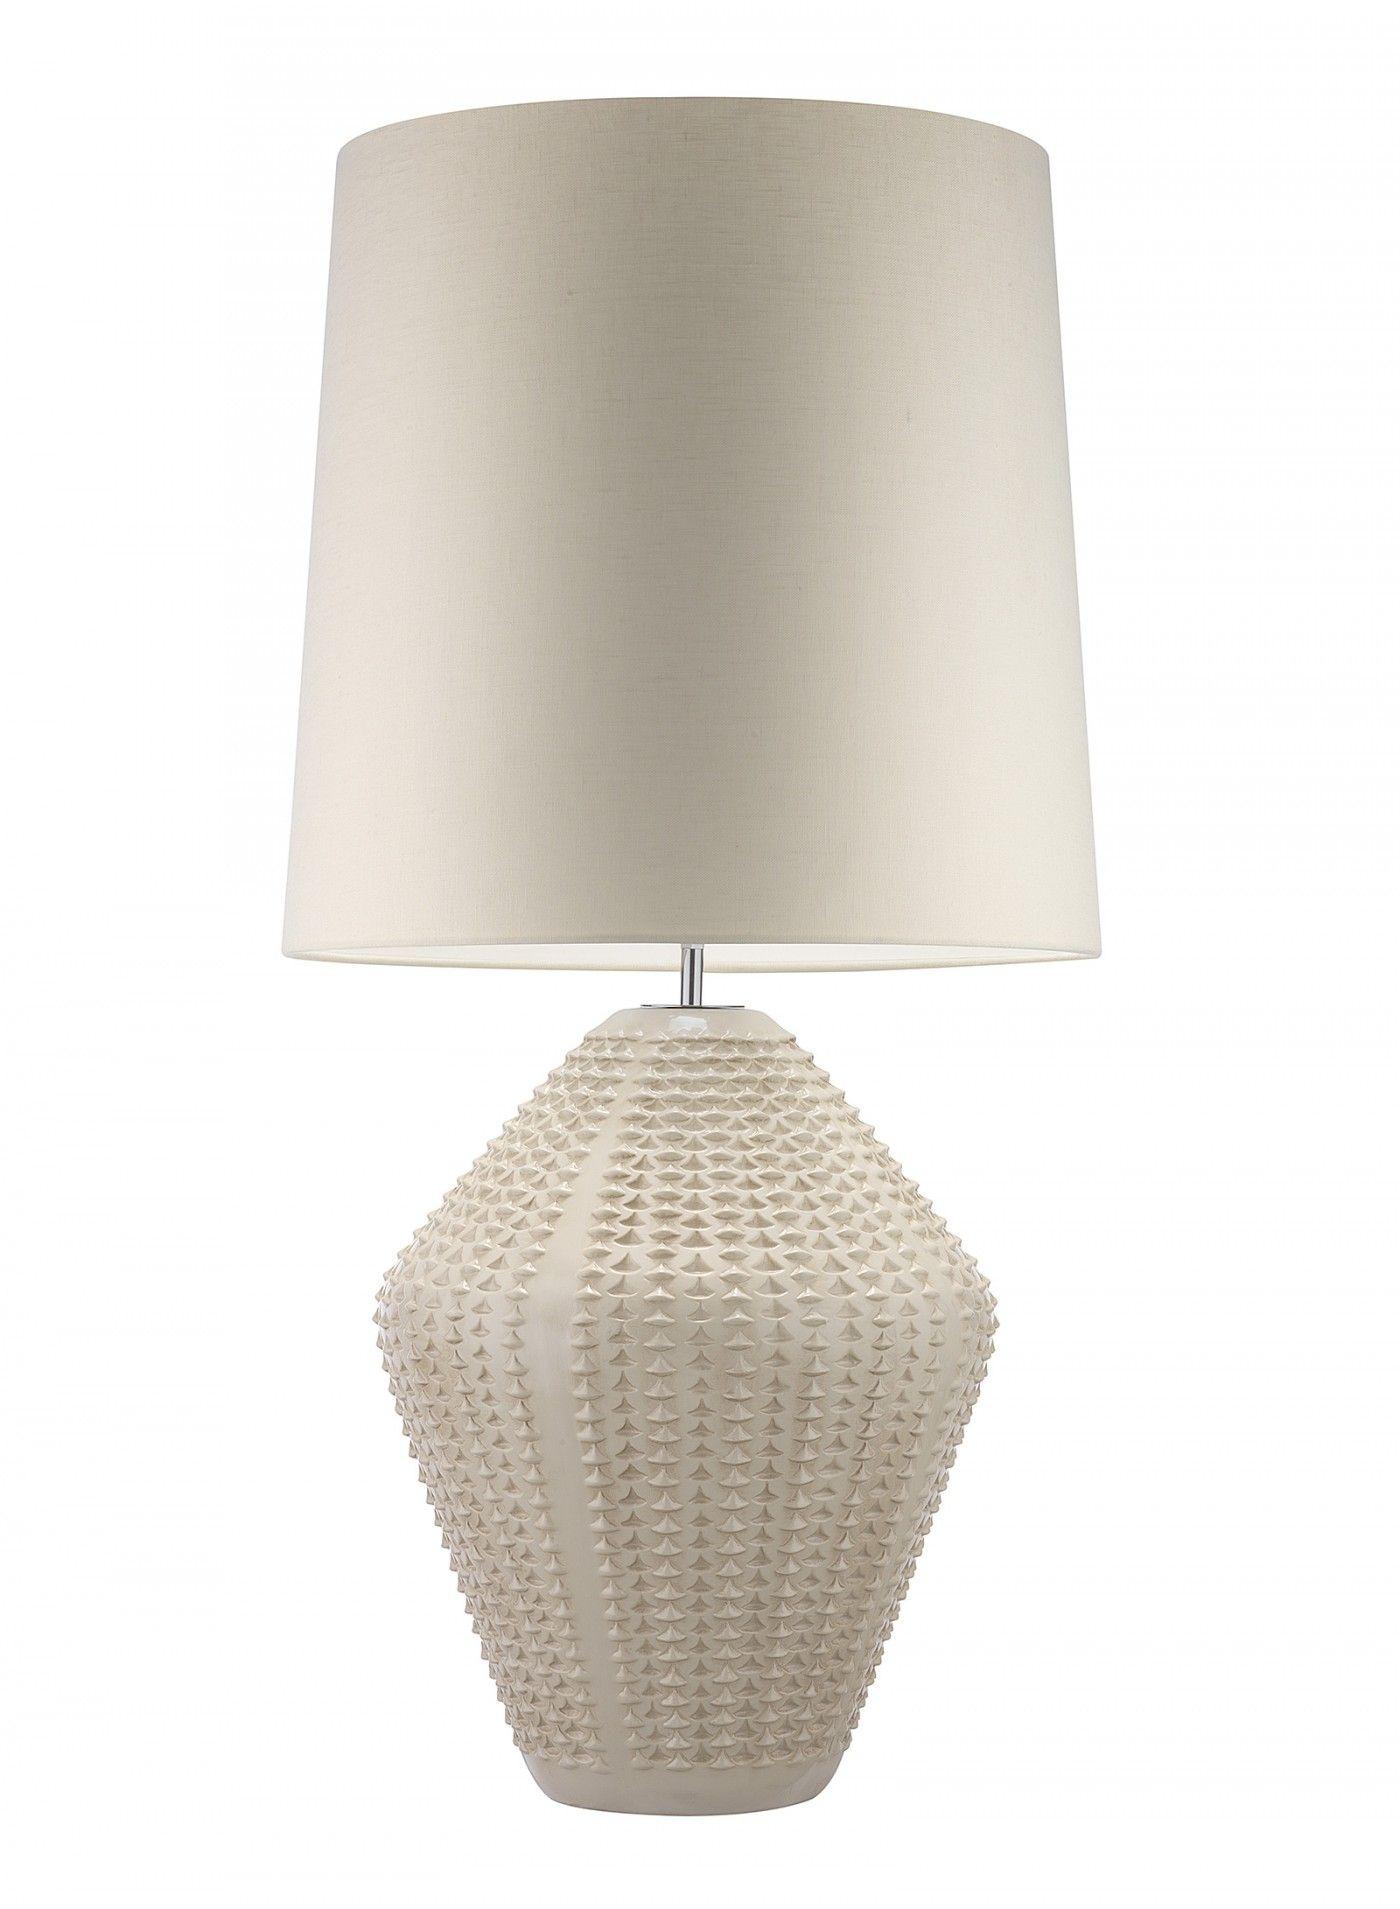 Regina Andrew Harlow Lamp Ivory Grey